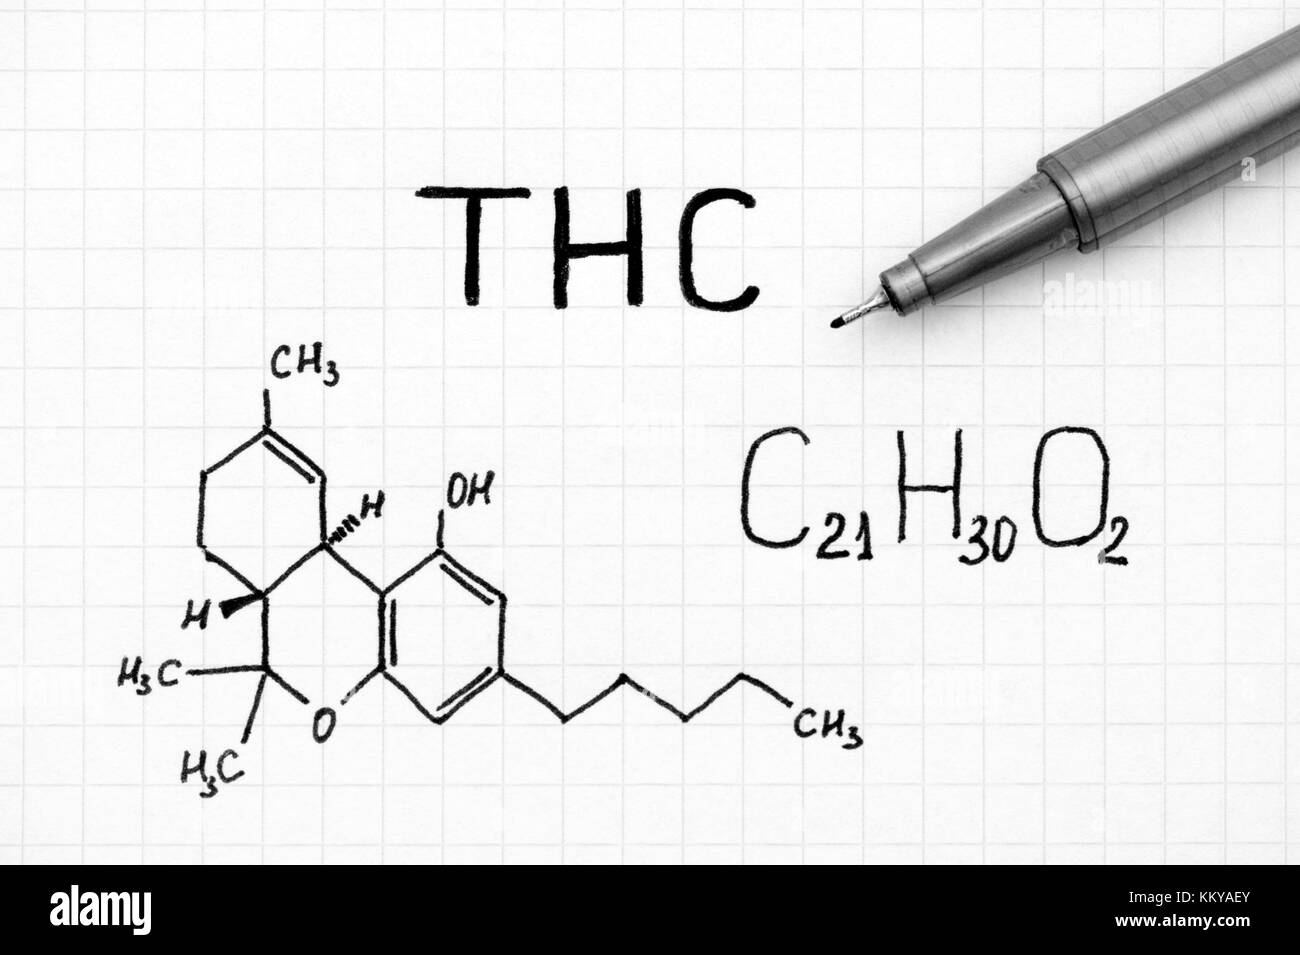 Chemical formula of Tetrahydrocannabinol (THC) with black pen. Close-up. Stock Photo